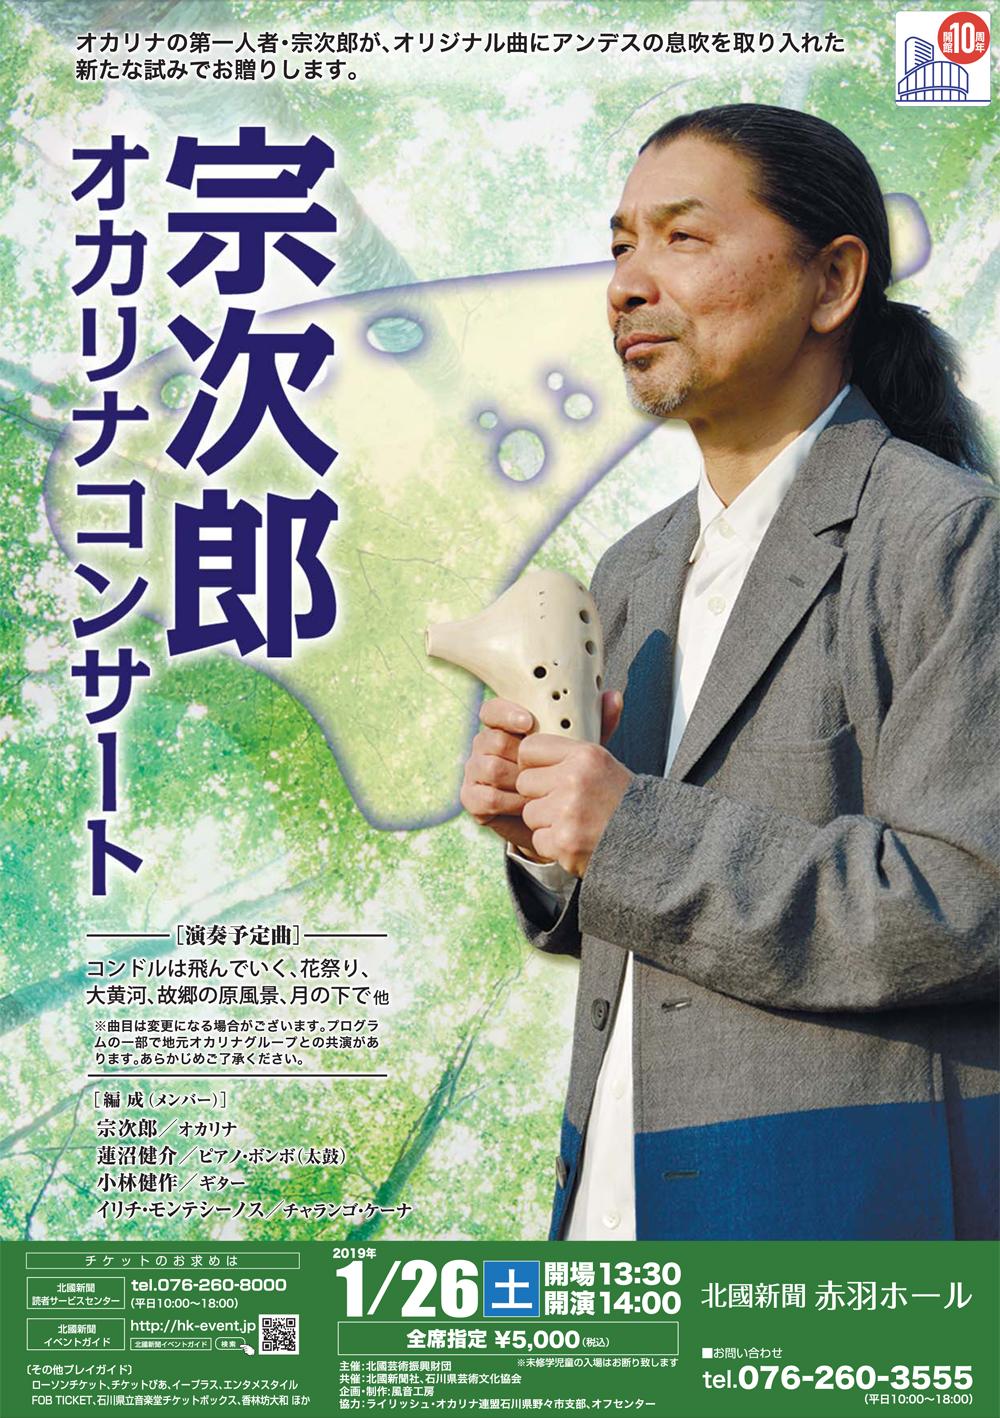 http://sojiro.net/contents/image/20190126.jpg